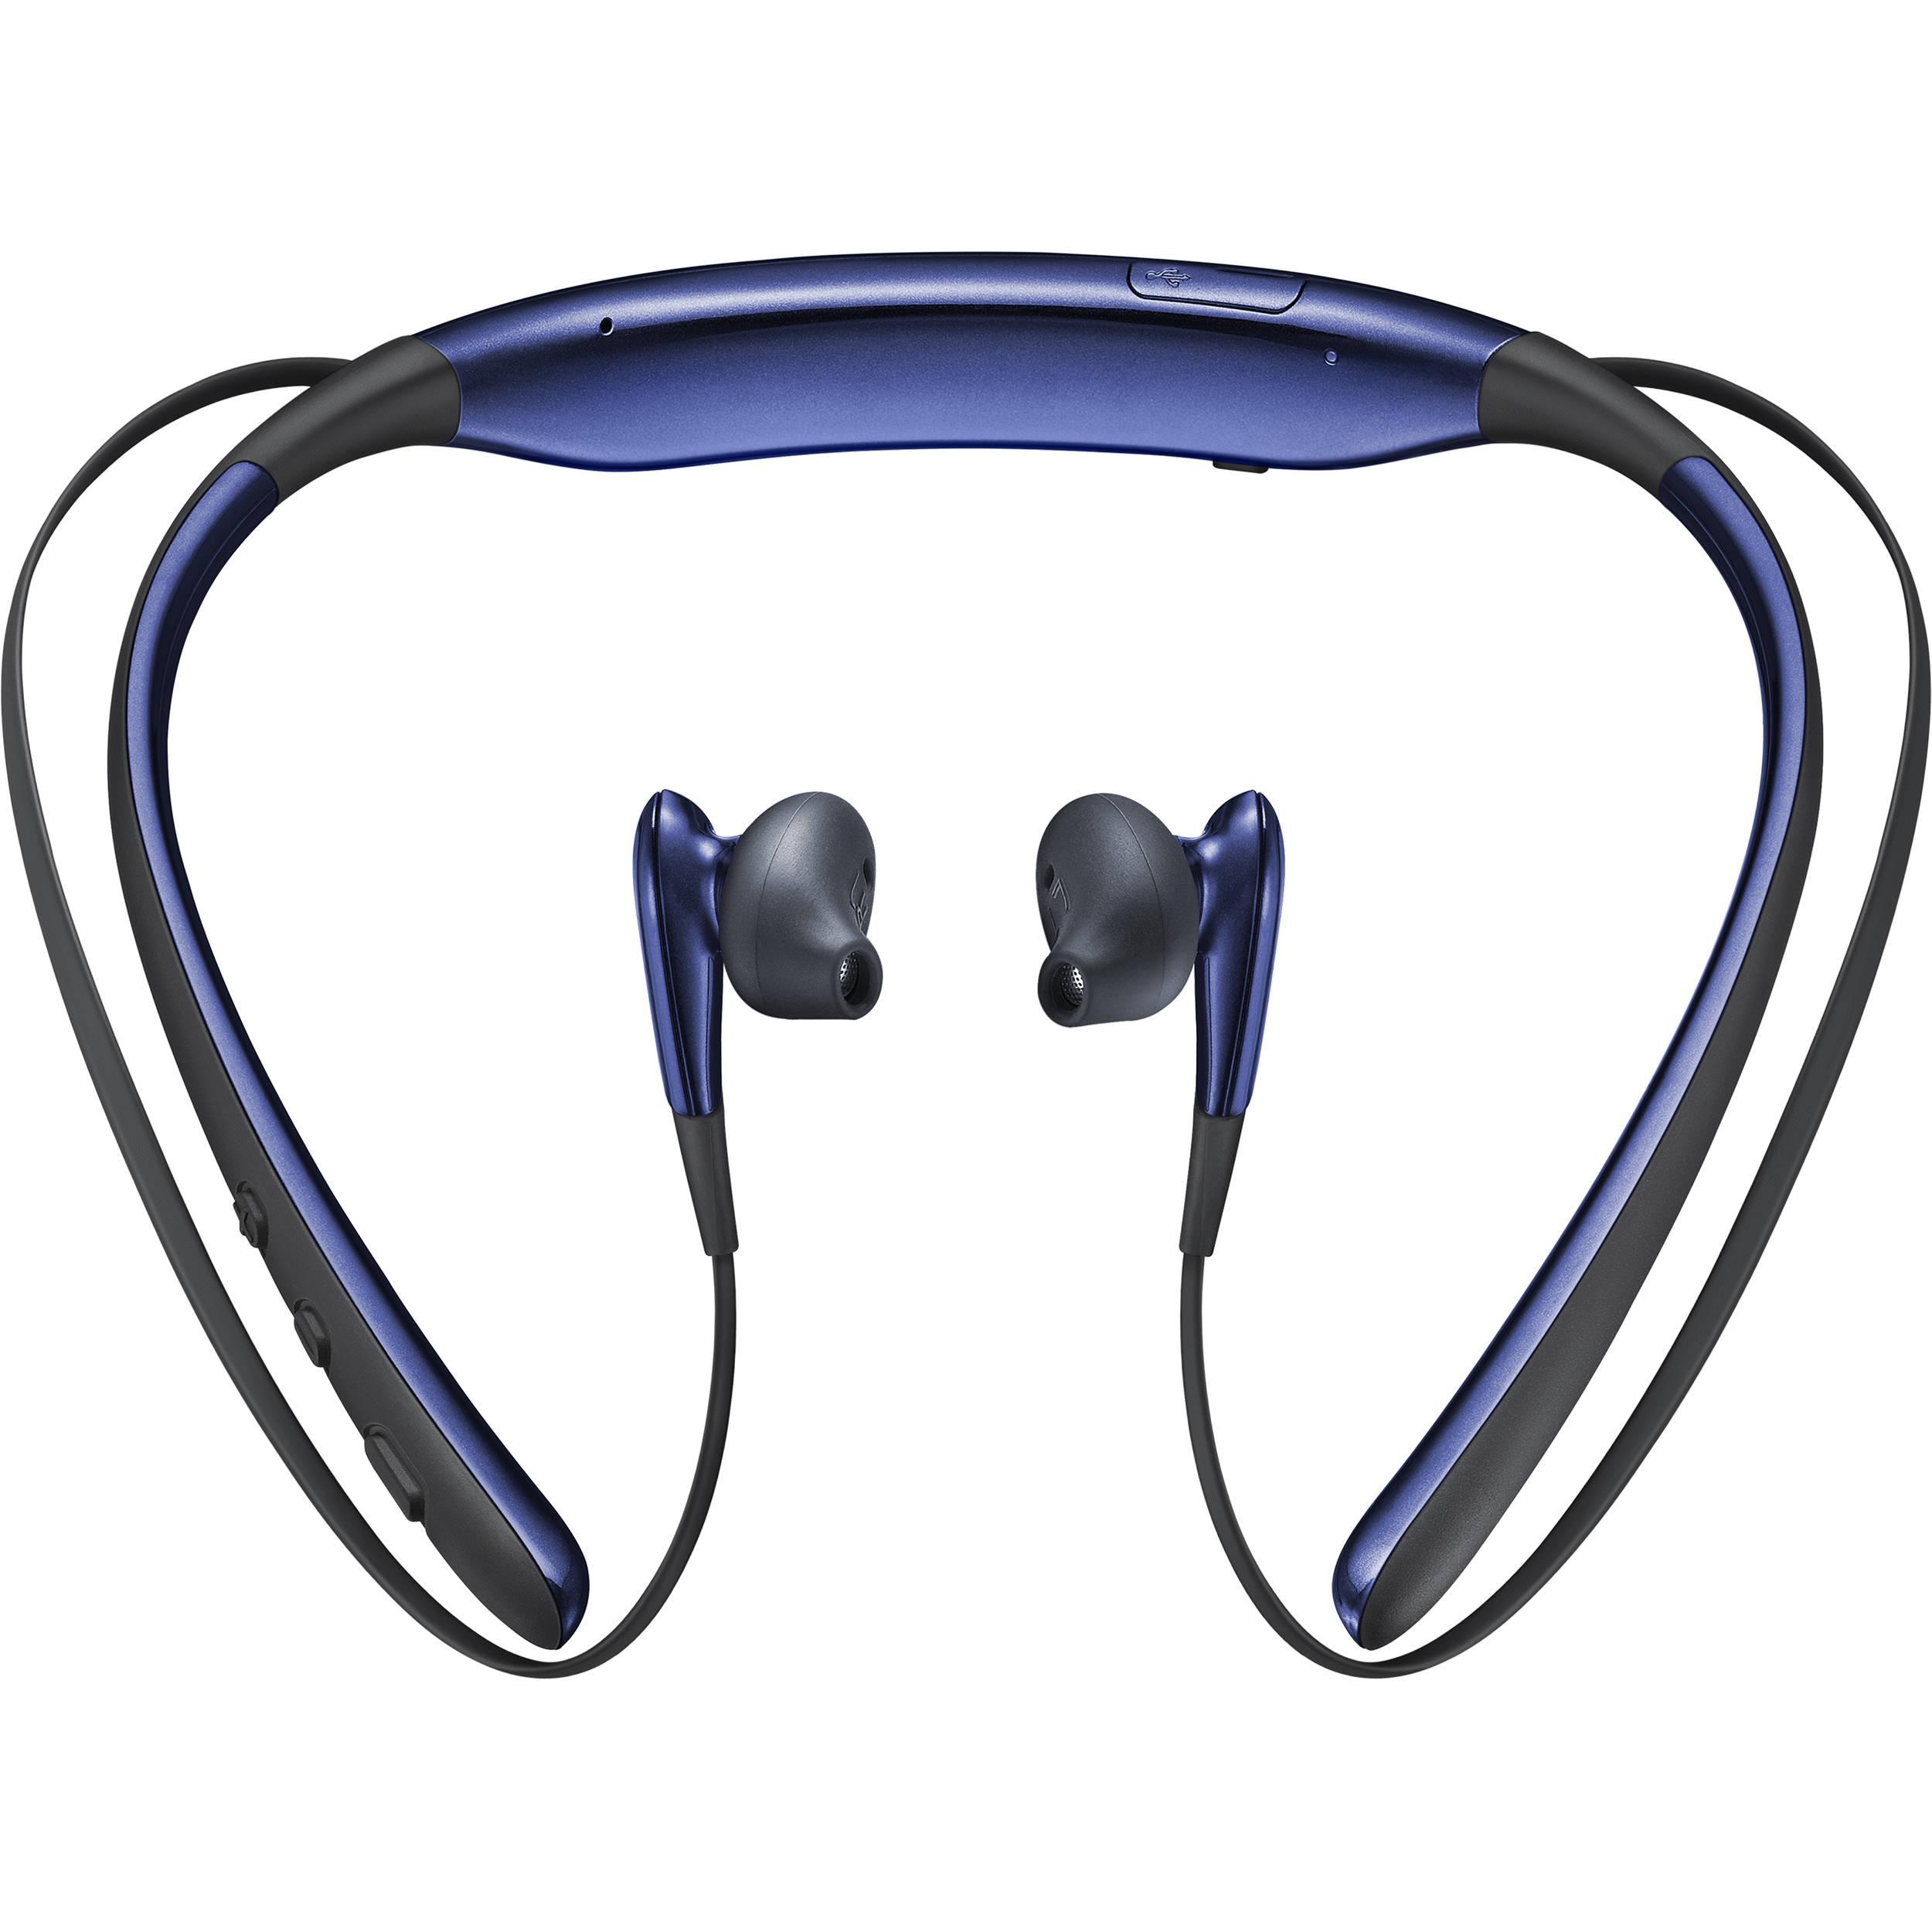 Level samsung bluetooth headphones - headphones samsung black